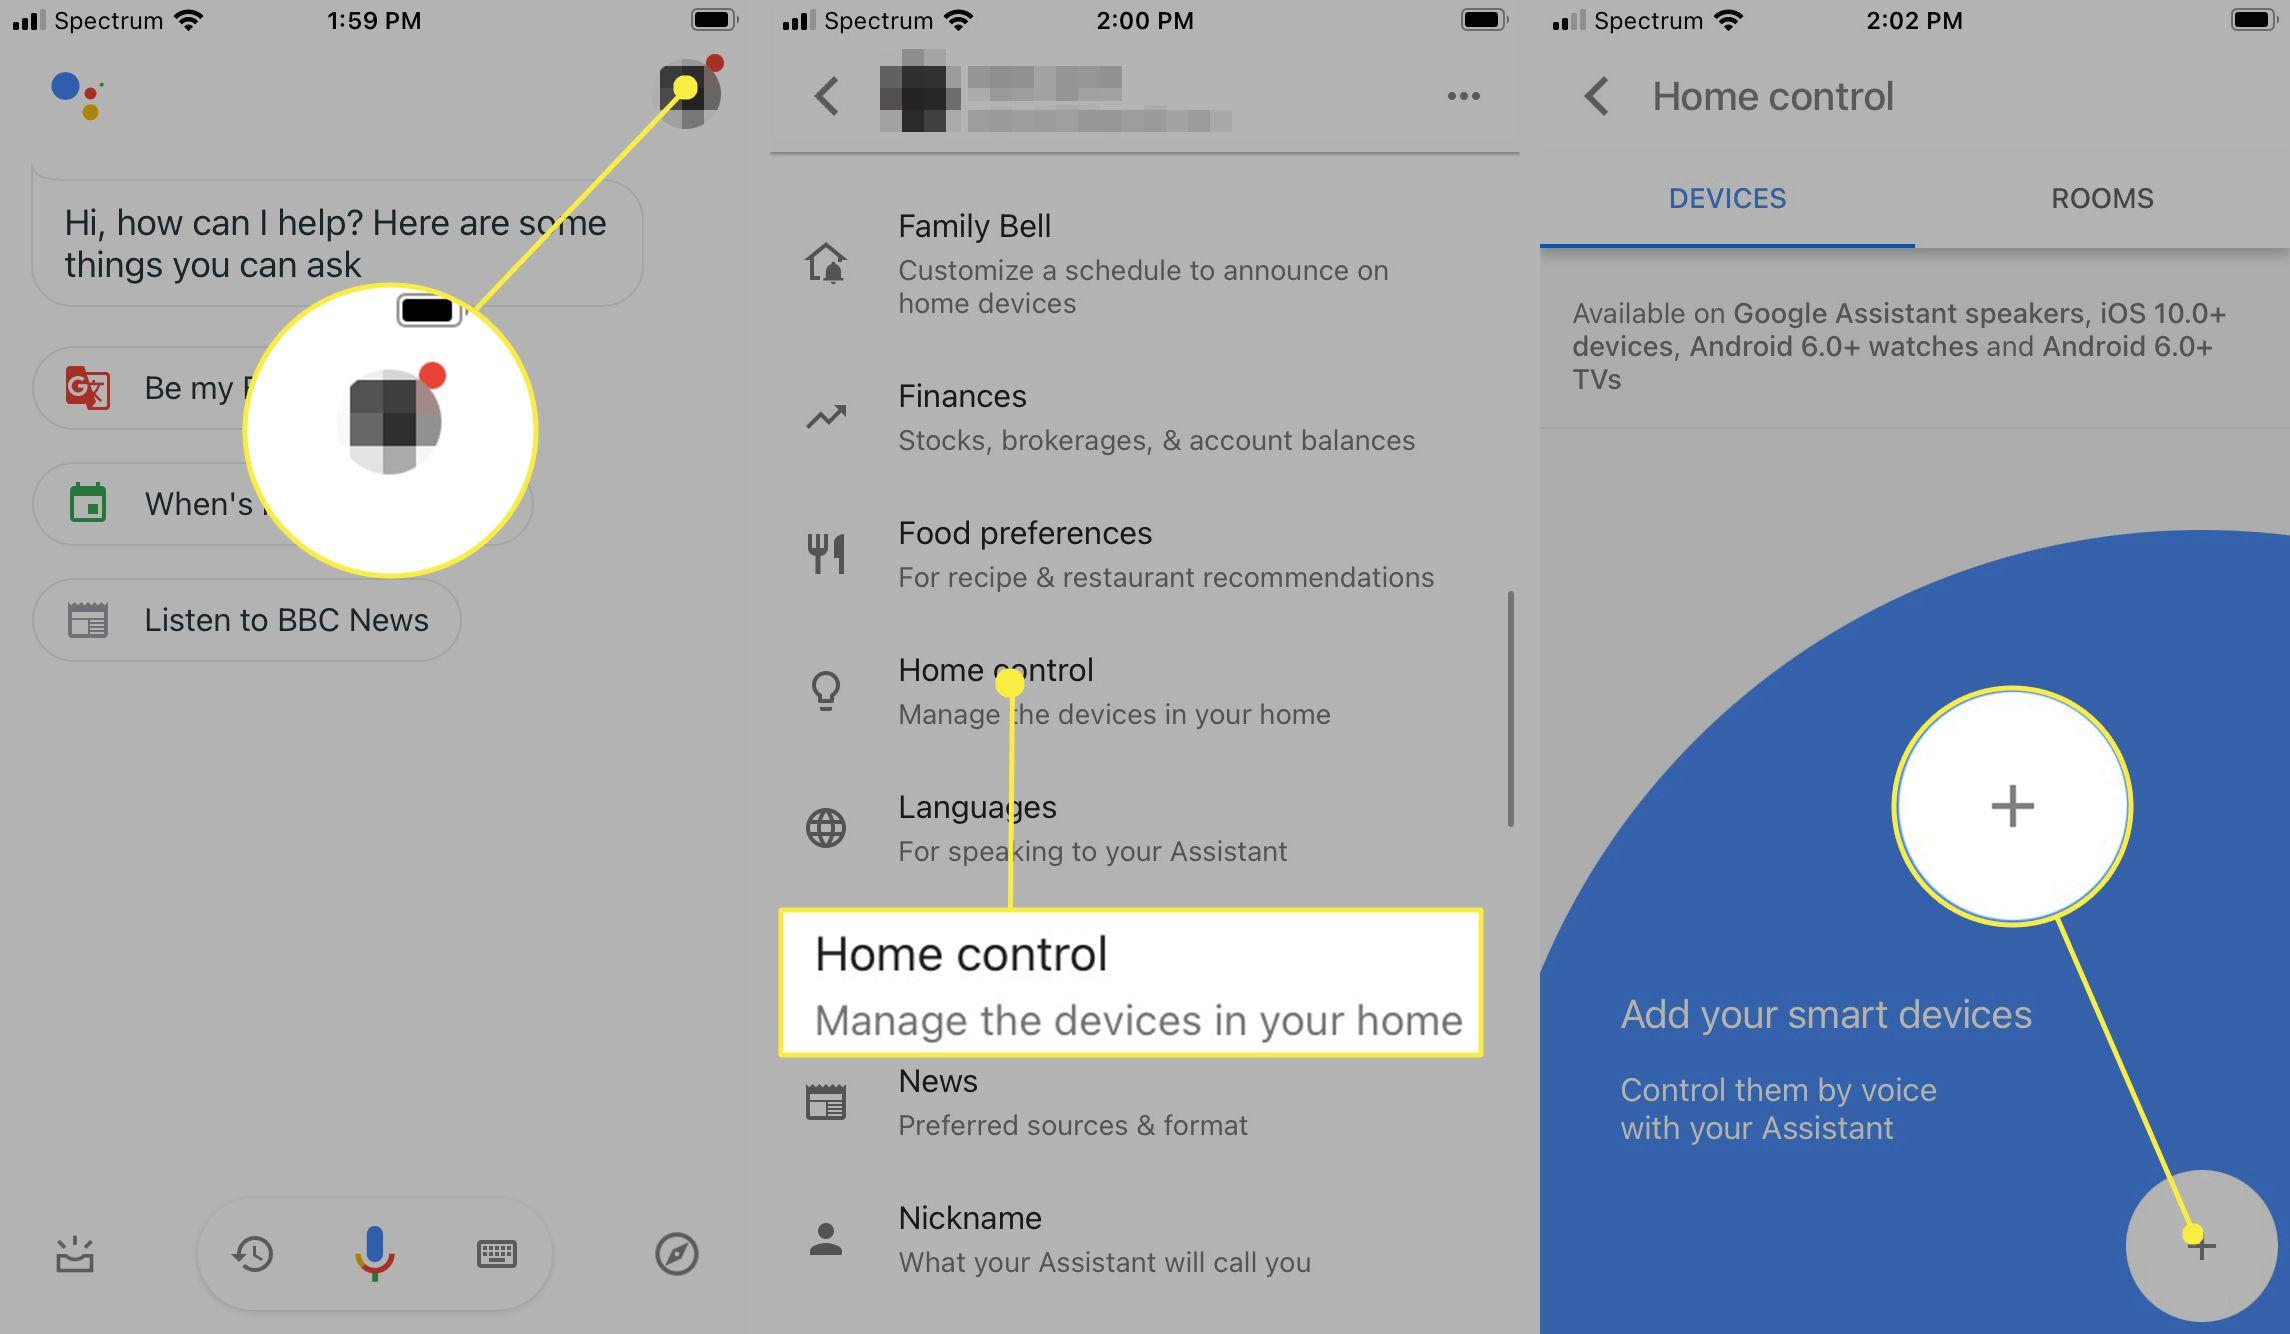 Google Assistant main menu and sub menus